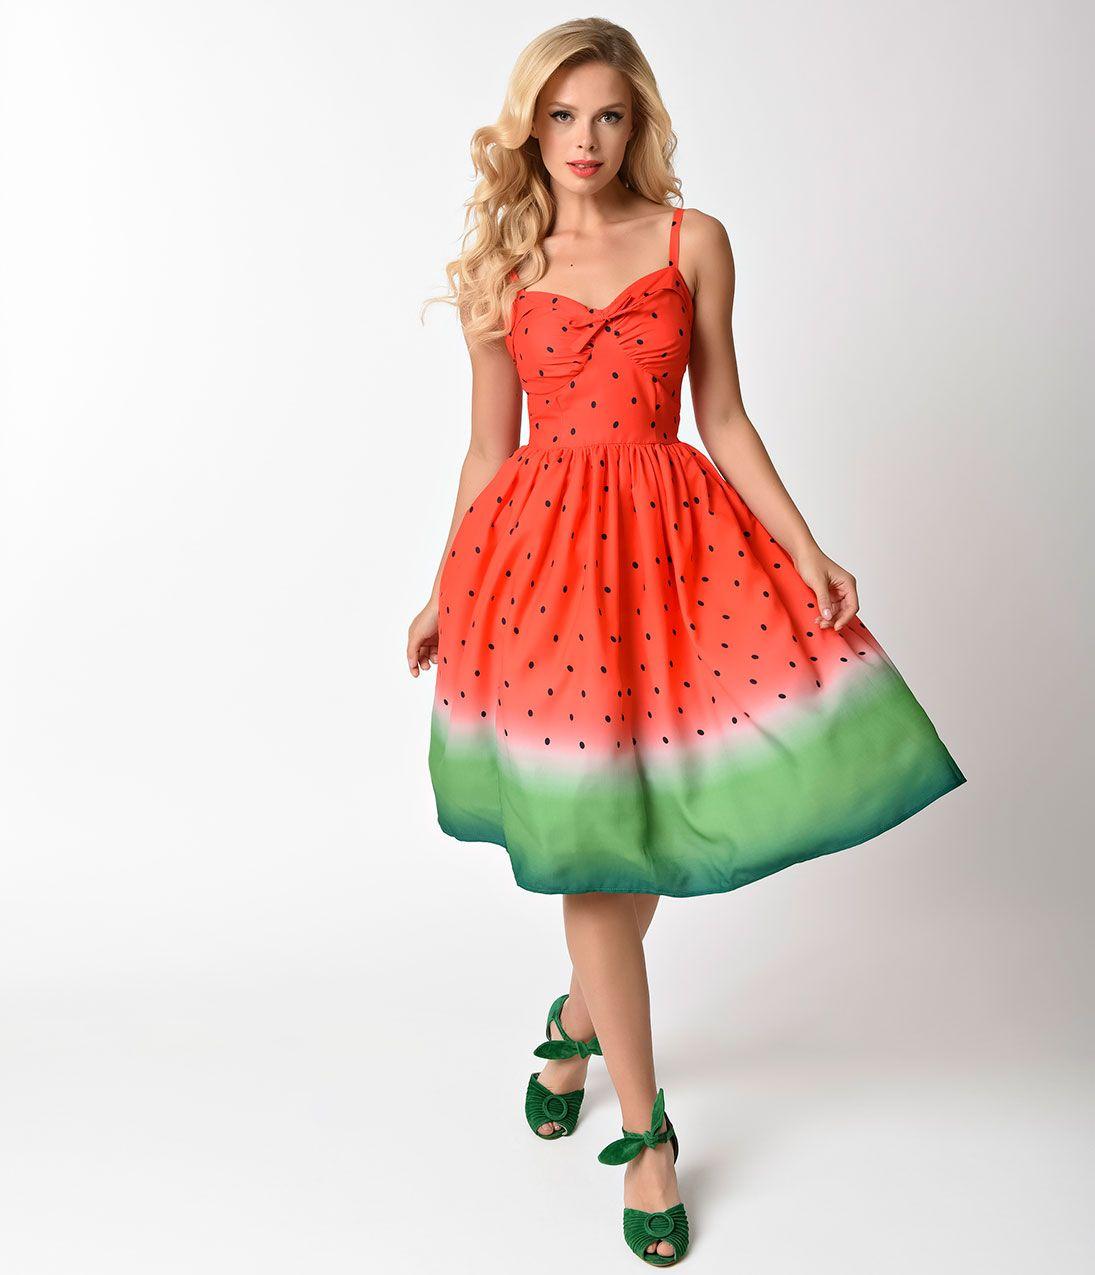 1950s Style Dresses, Pinup Dresses, Swing Dresses | Vintage ...